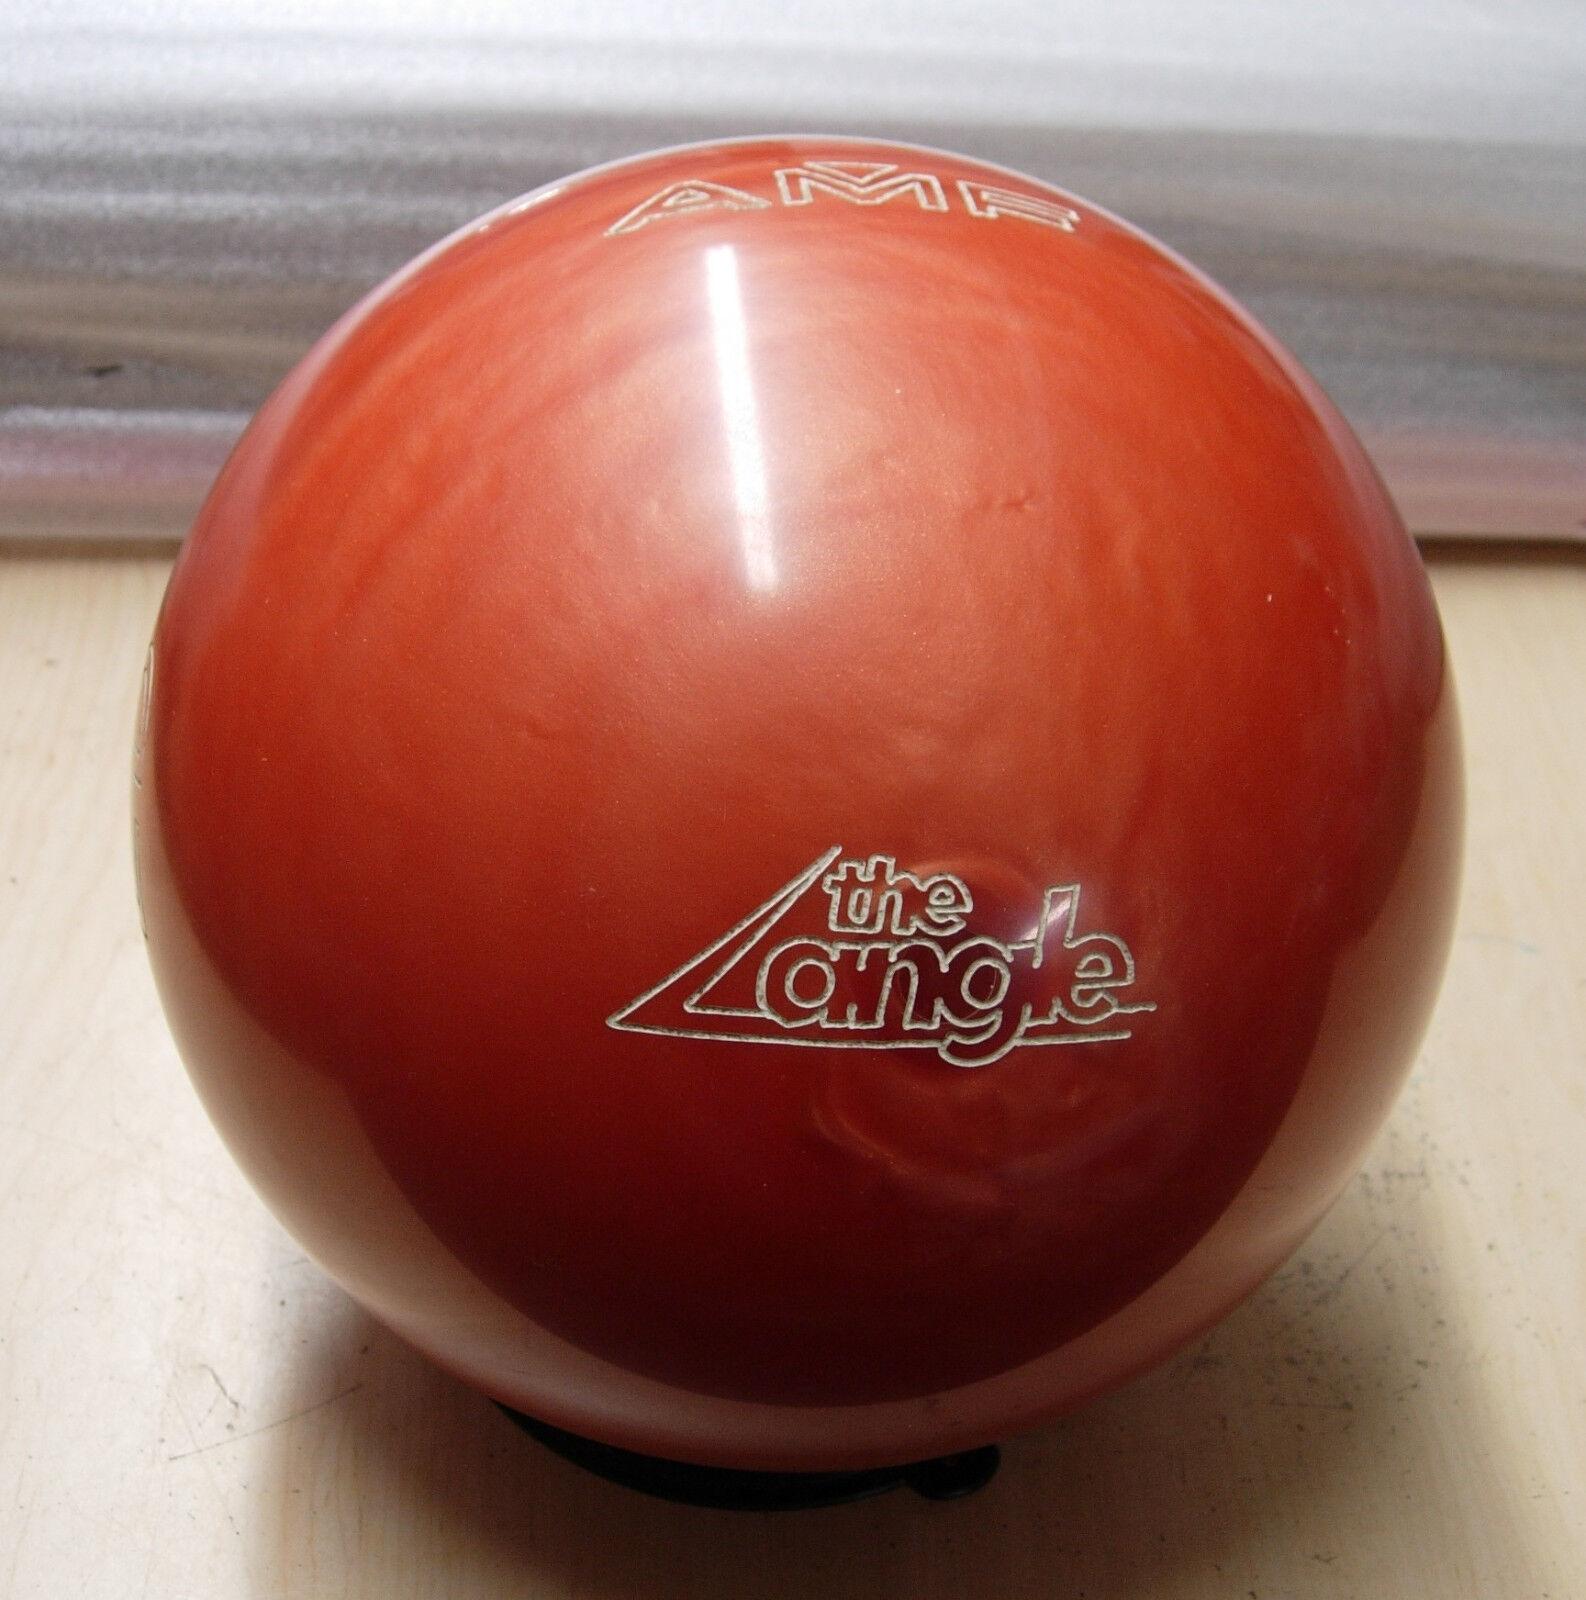 15oz TW 4-1 8 AMF 1987 Angle LD (Limited Distance) orange Swirl Urethane Ball